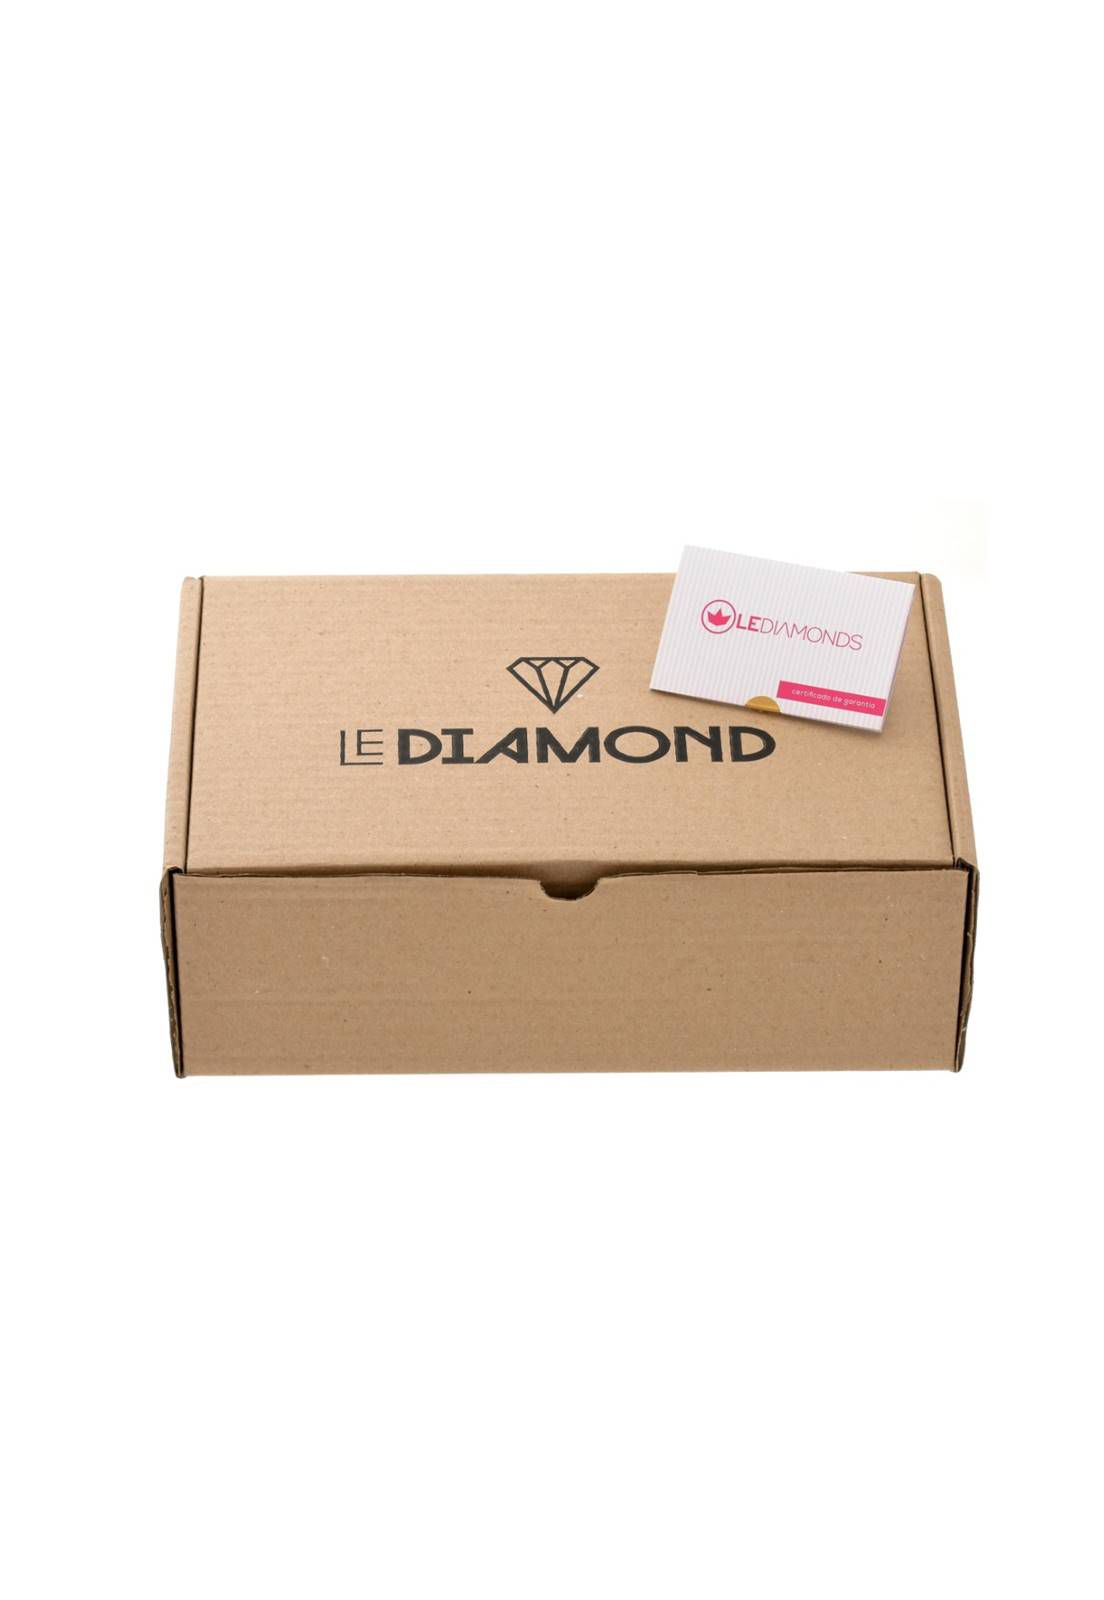 Brinco Le Diamond Porcelanato e Base Seda